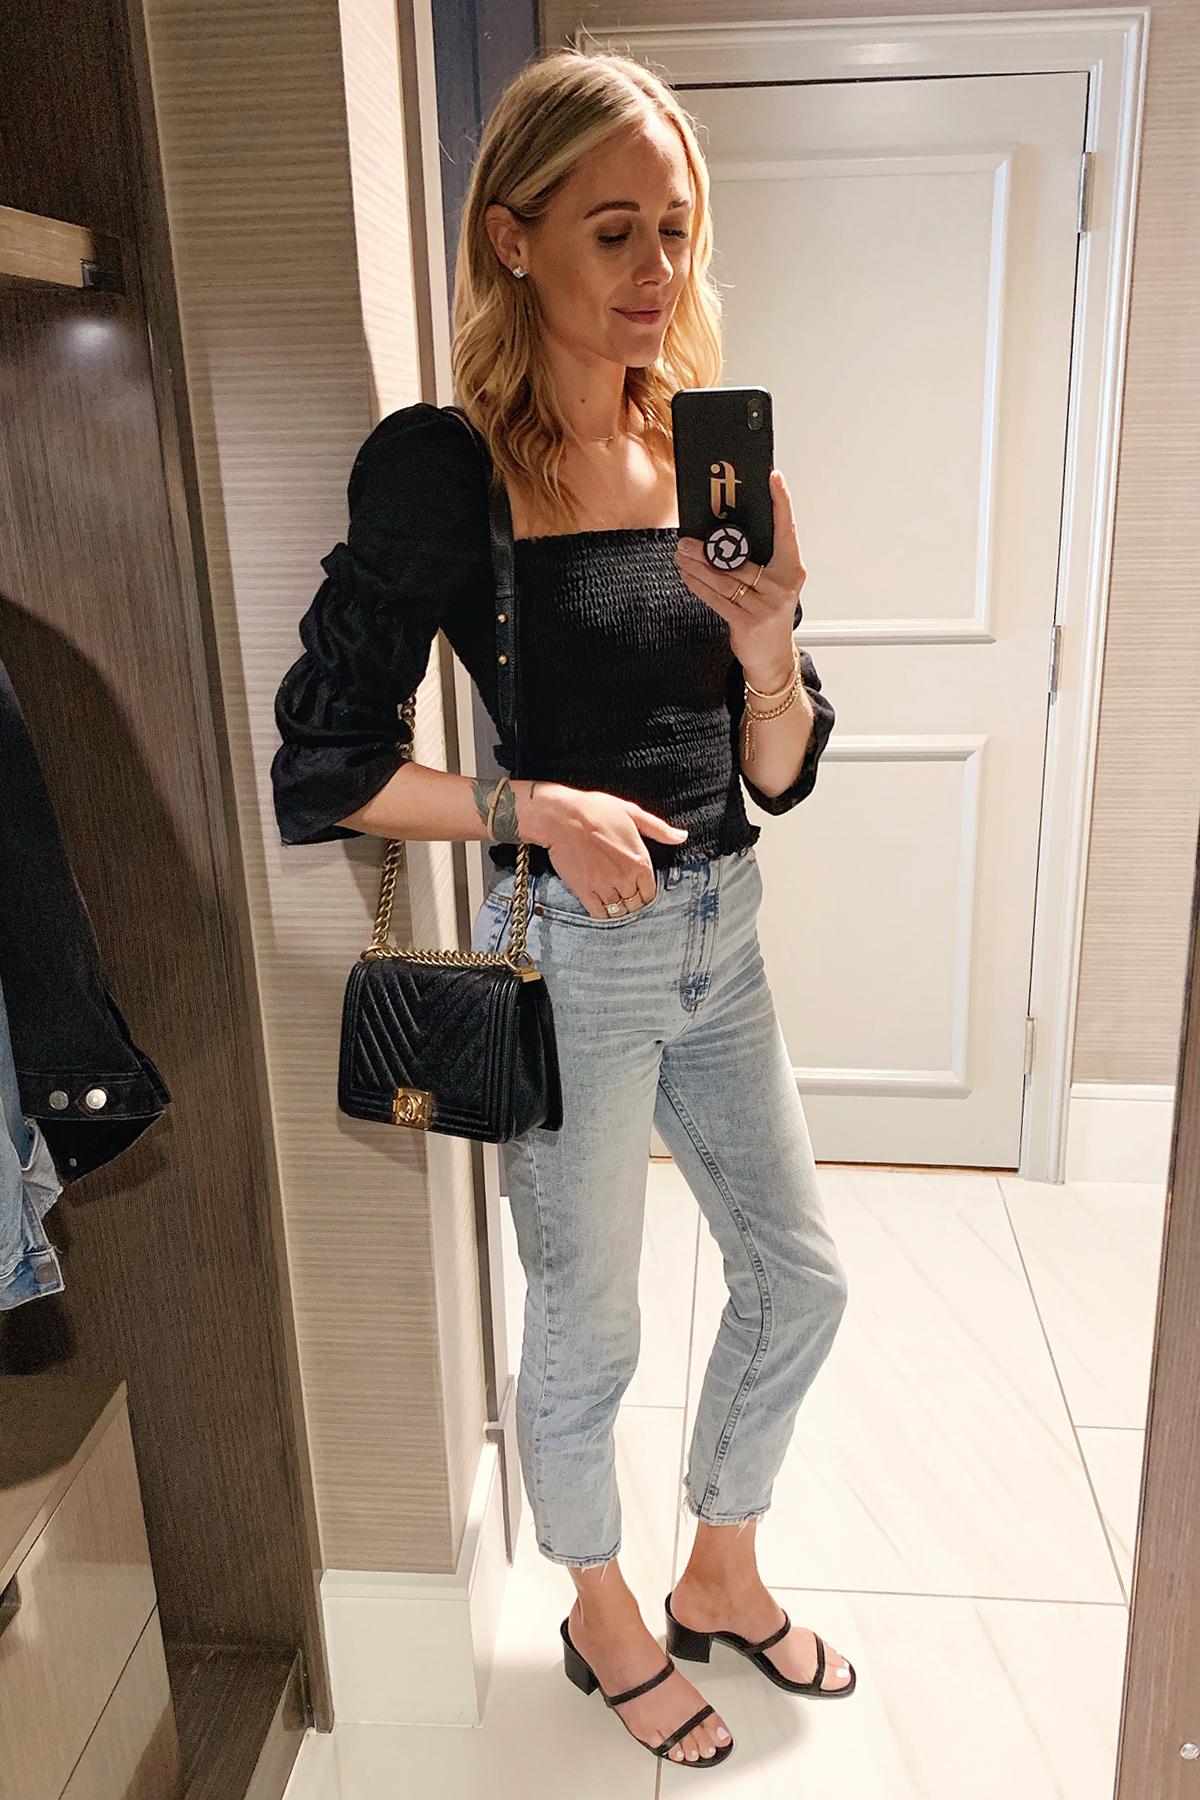 Fashion Jackson Wearing Black Smocked Blouse Denim Jeans Black Sandals Chanel Black Boy Bag